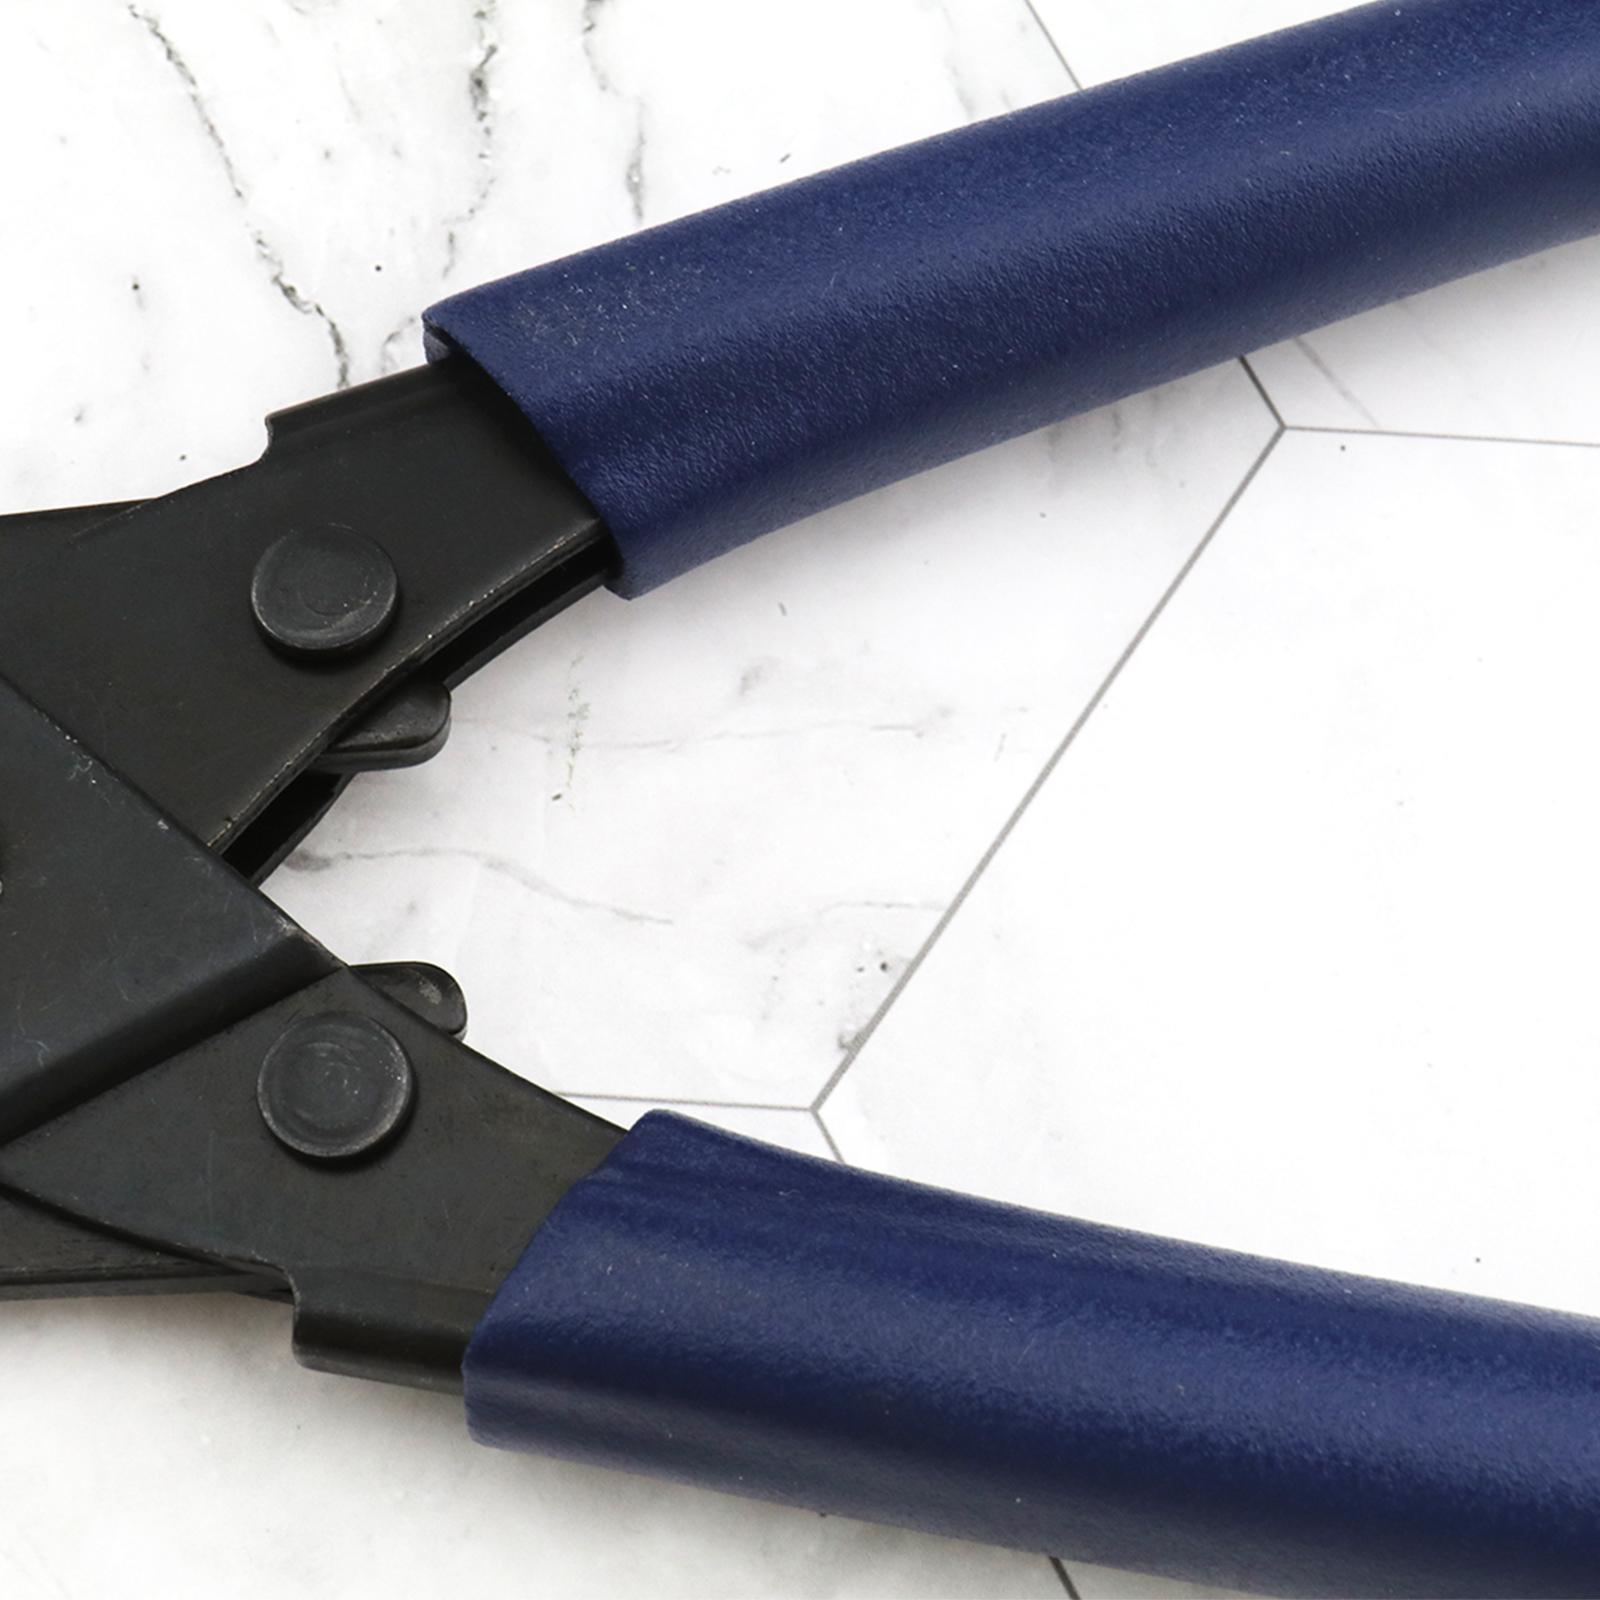 Sa Style Crimp Tool Wiring Harness Crimper Open Barrel For Molex 22 10awg Plier